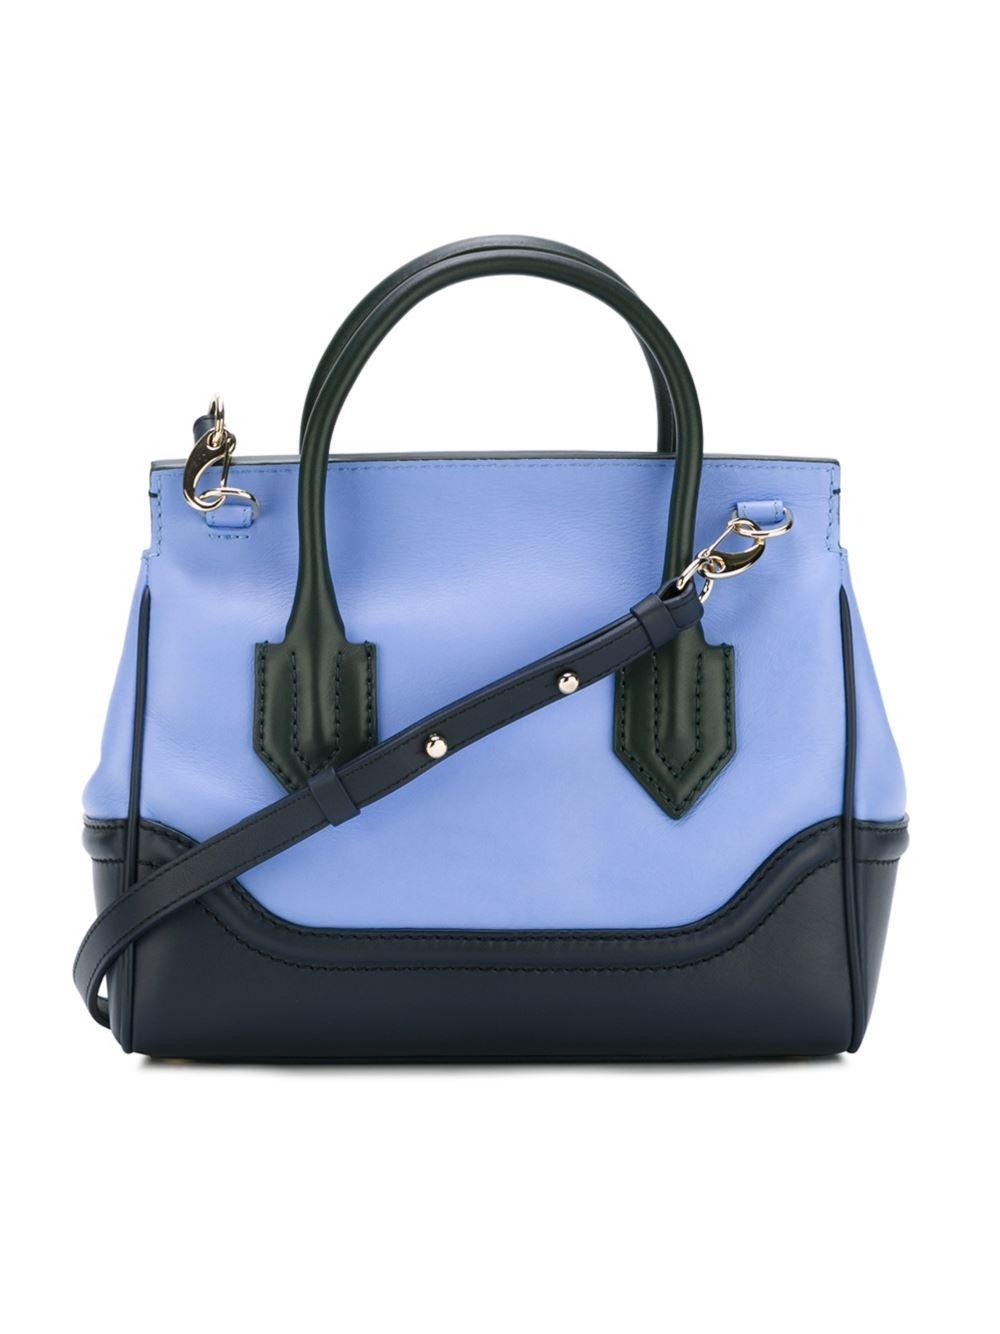 56481bc9c2 Lyst - Versace Palazzo Empire Tote in Blue